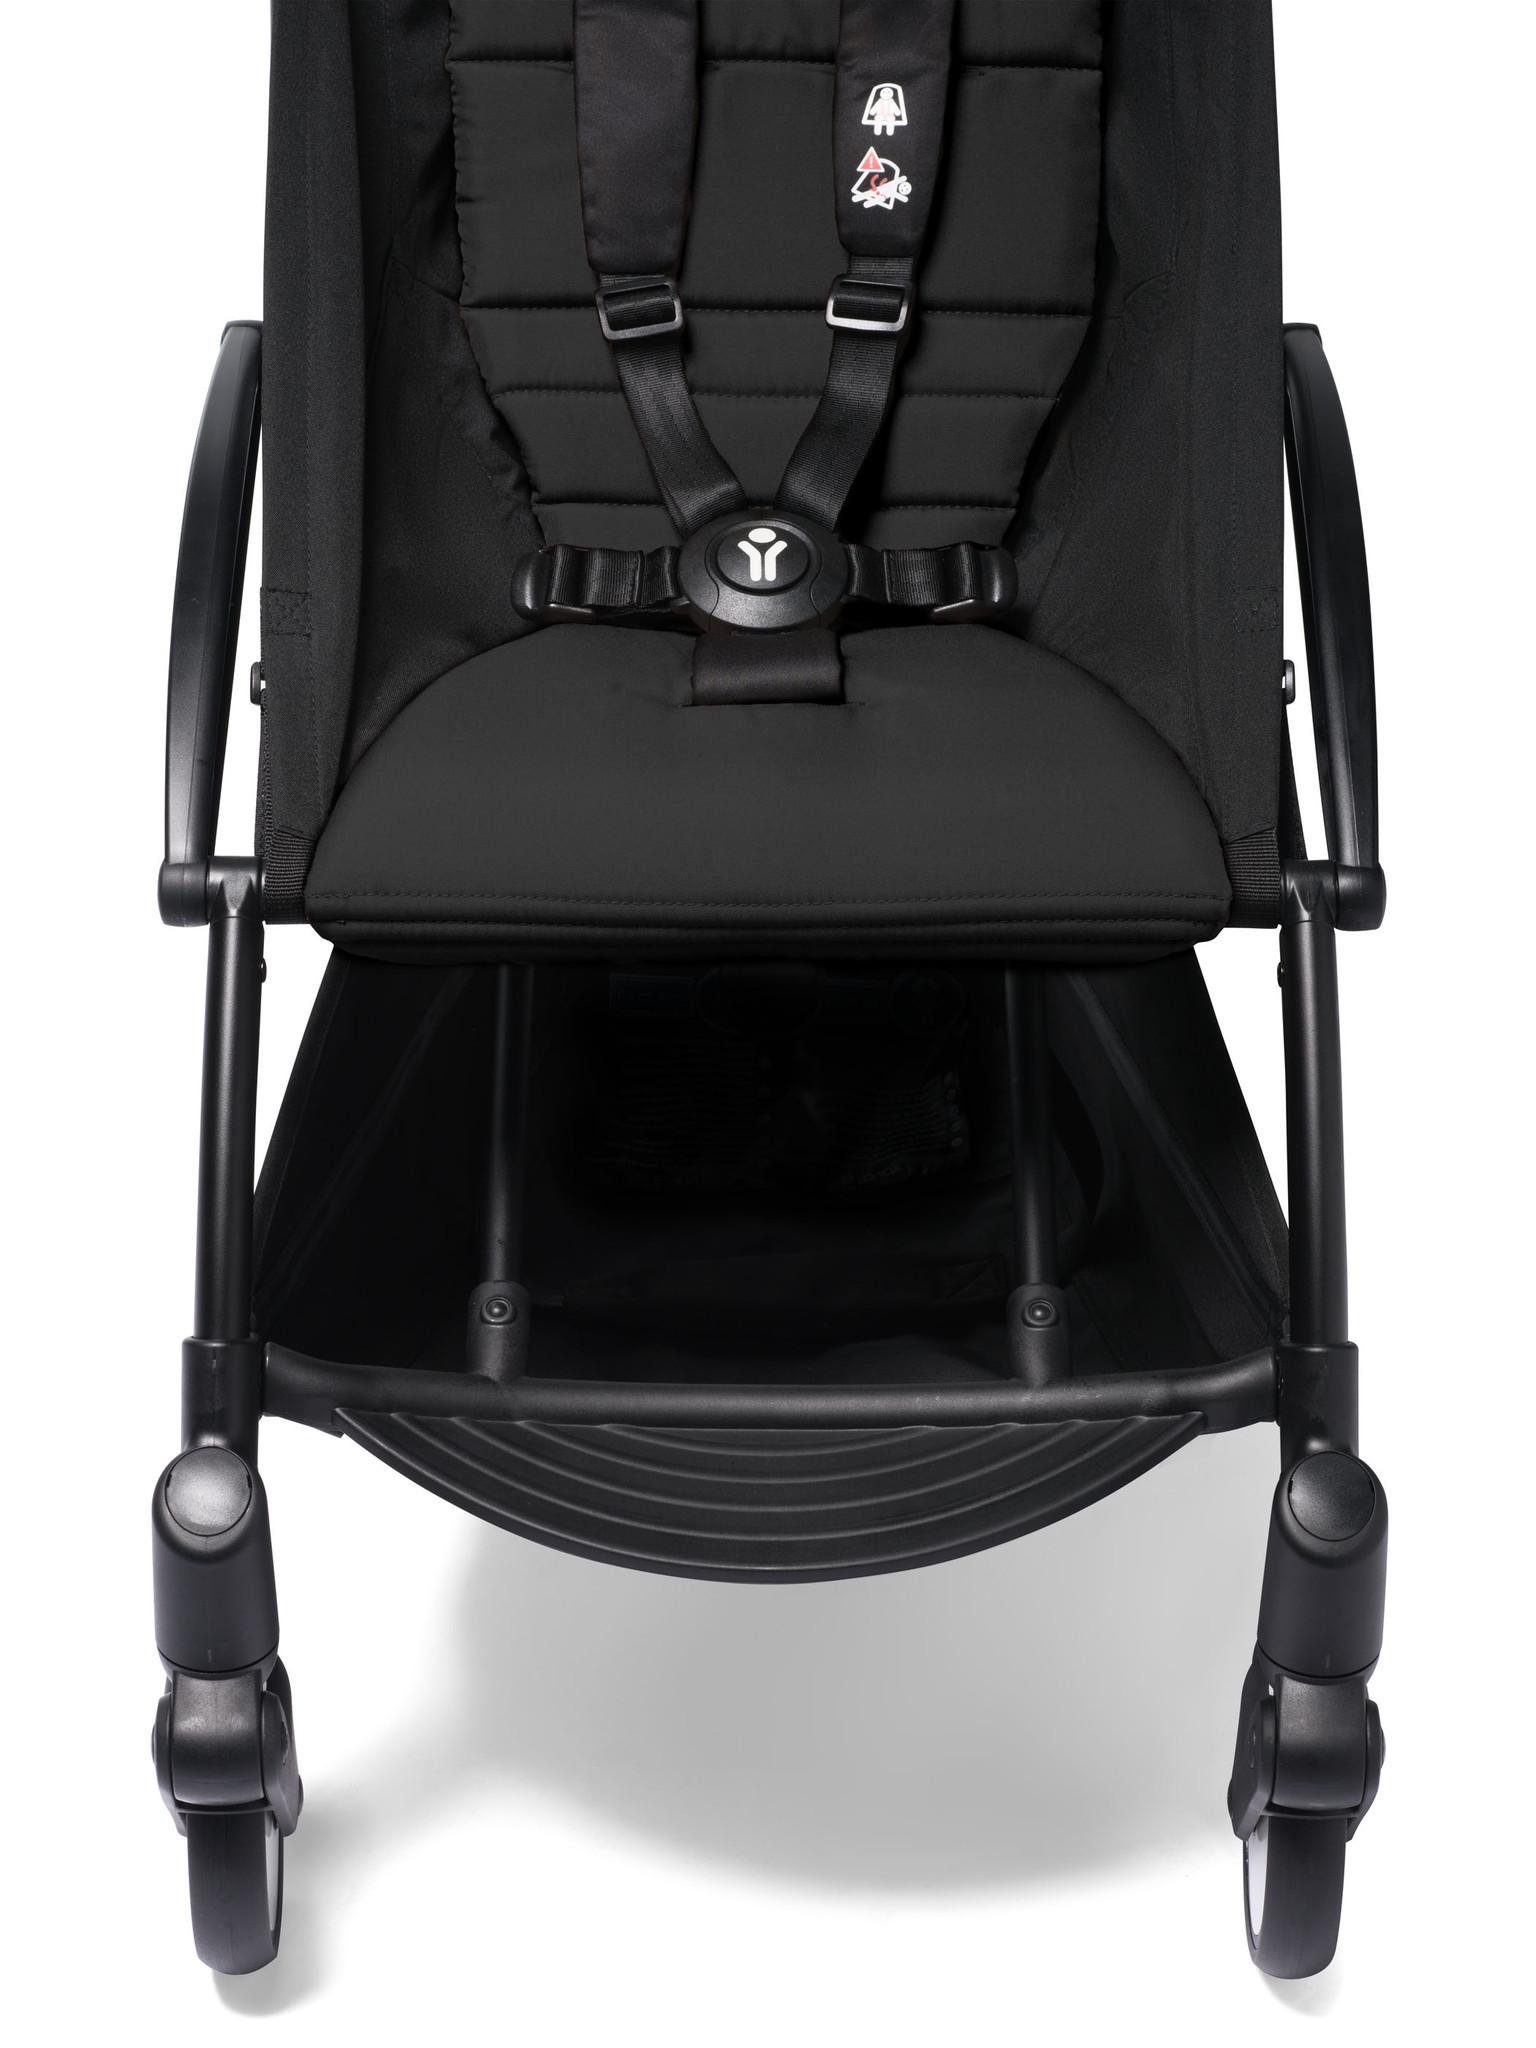 Babyzen Babyzen YOYO² buggy COMPLEET / FULL SET 0+ and 6+ zwart frame zwart incl. YOYO² BeSafe autostoel zwart